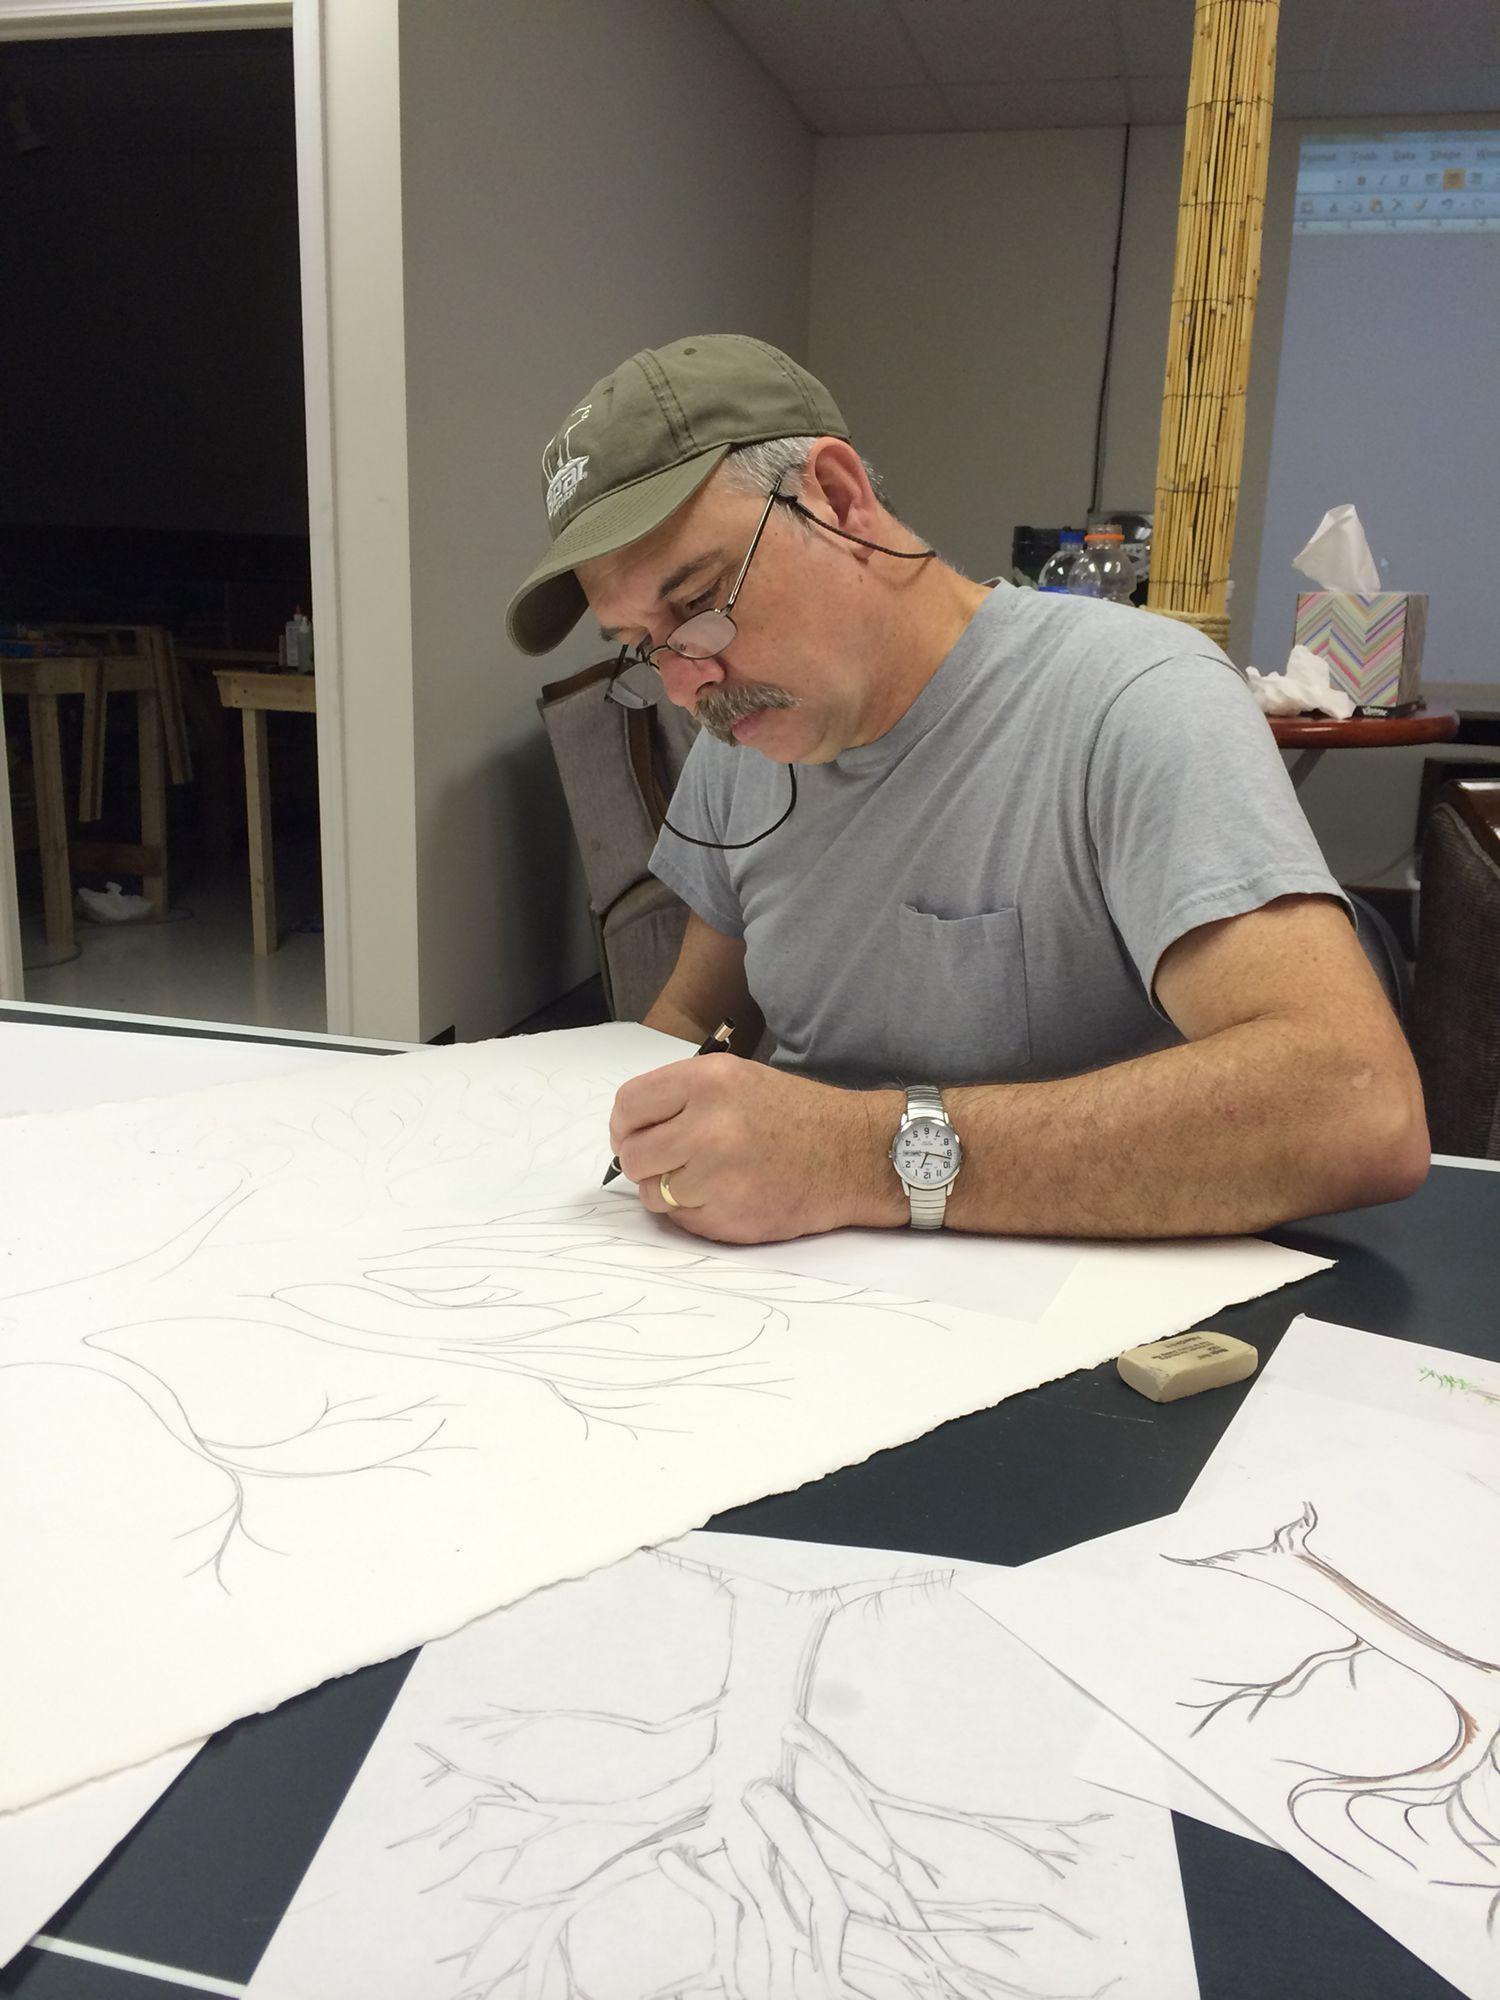 Guest registry tree thumb prints. Frank drawing.